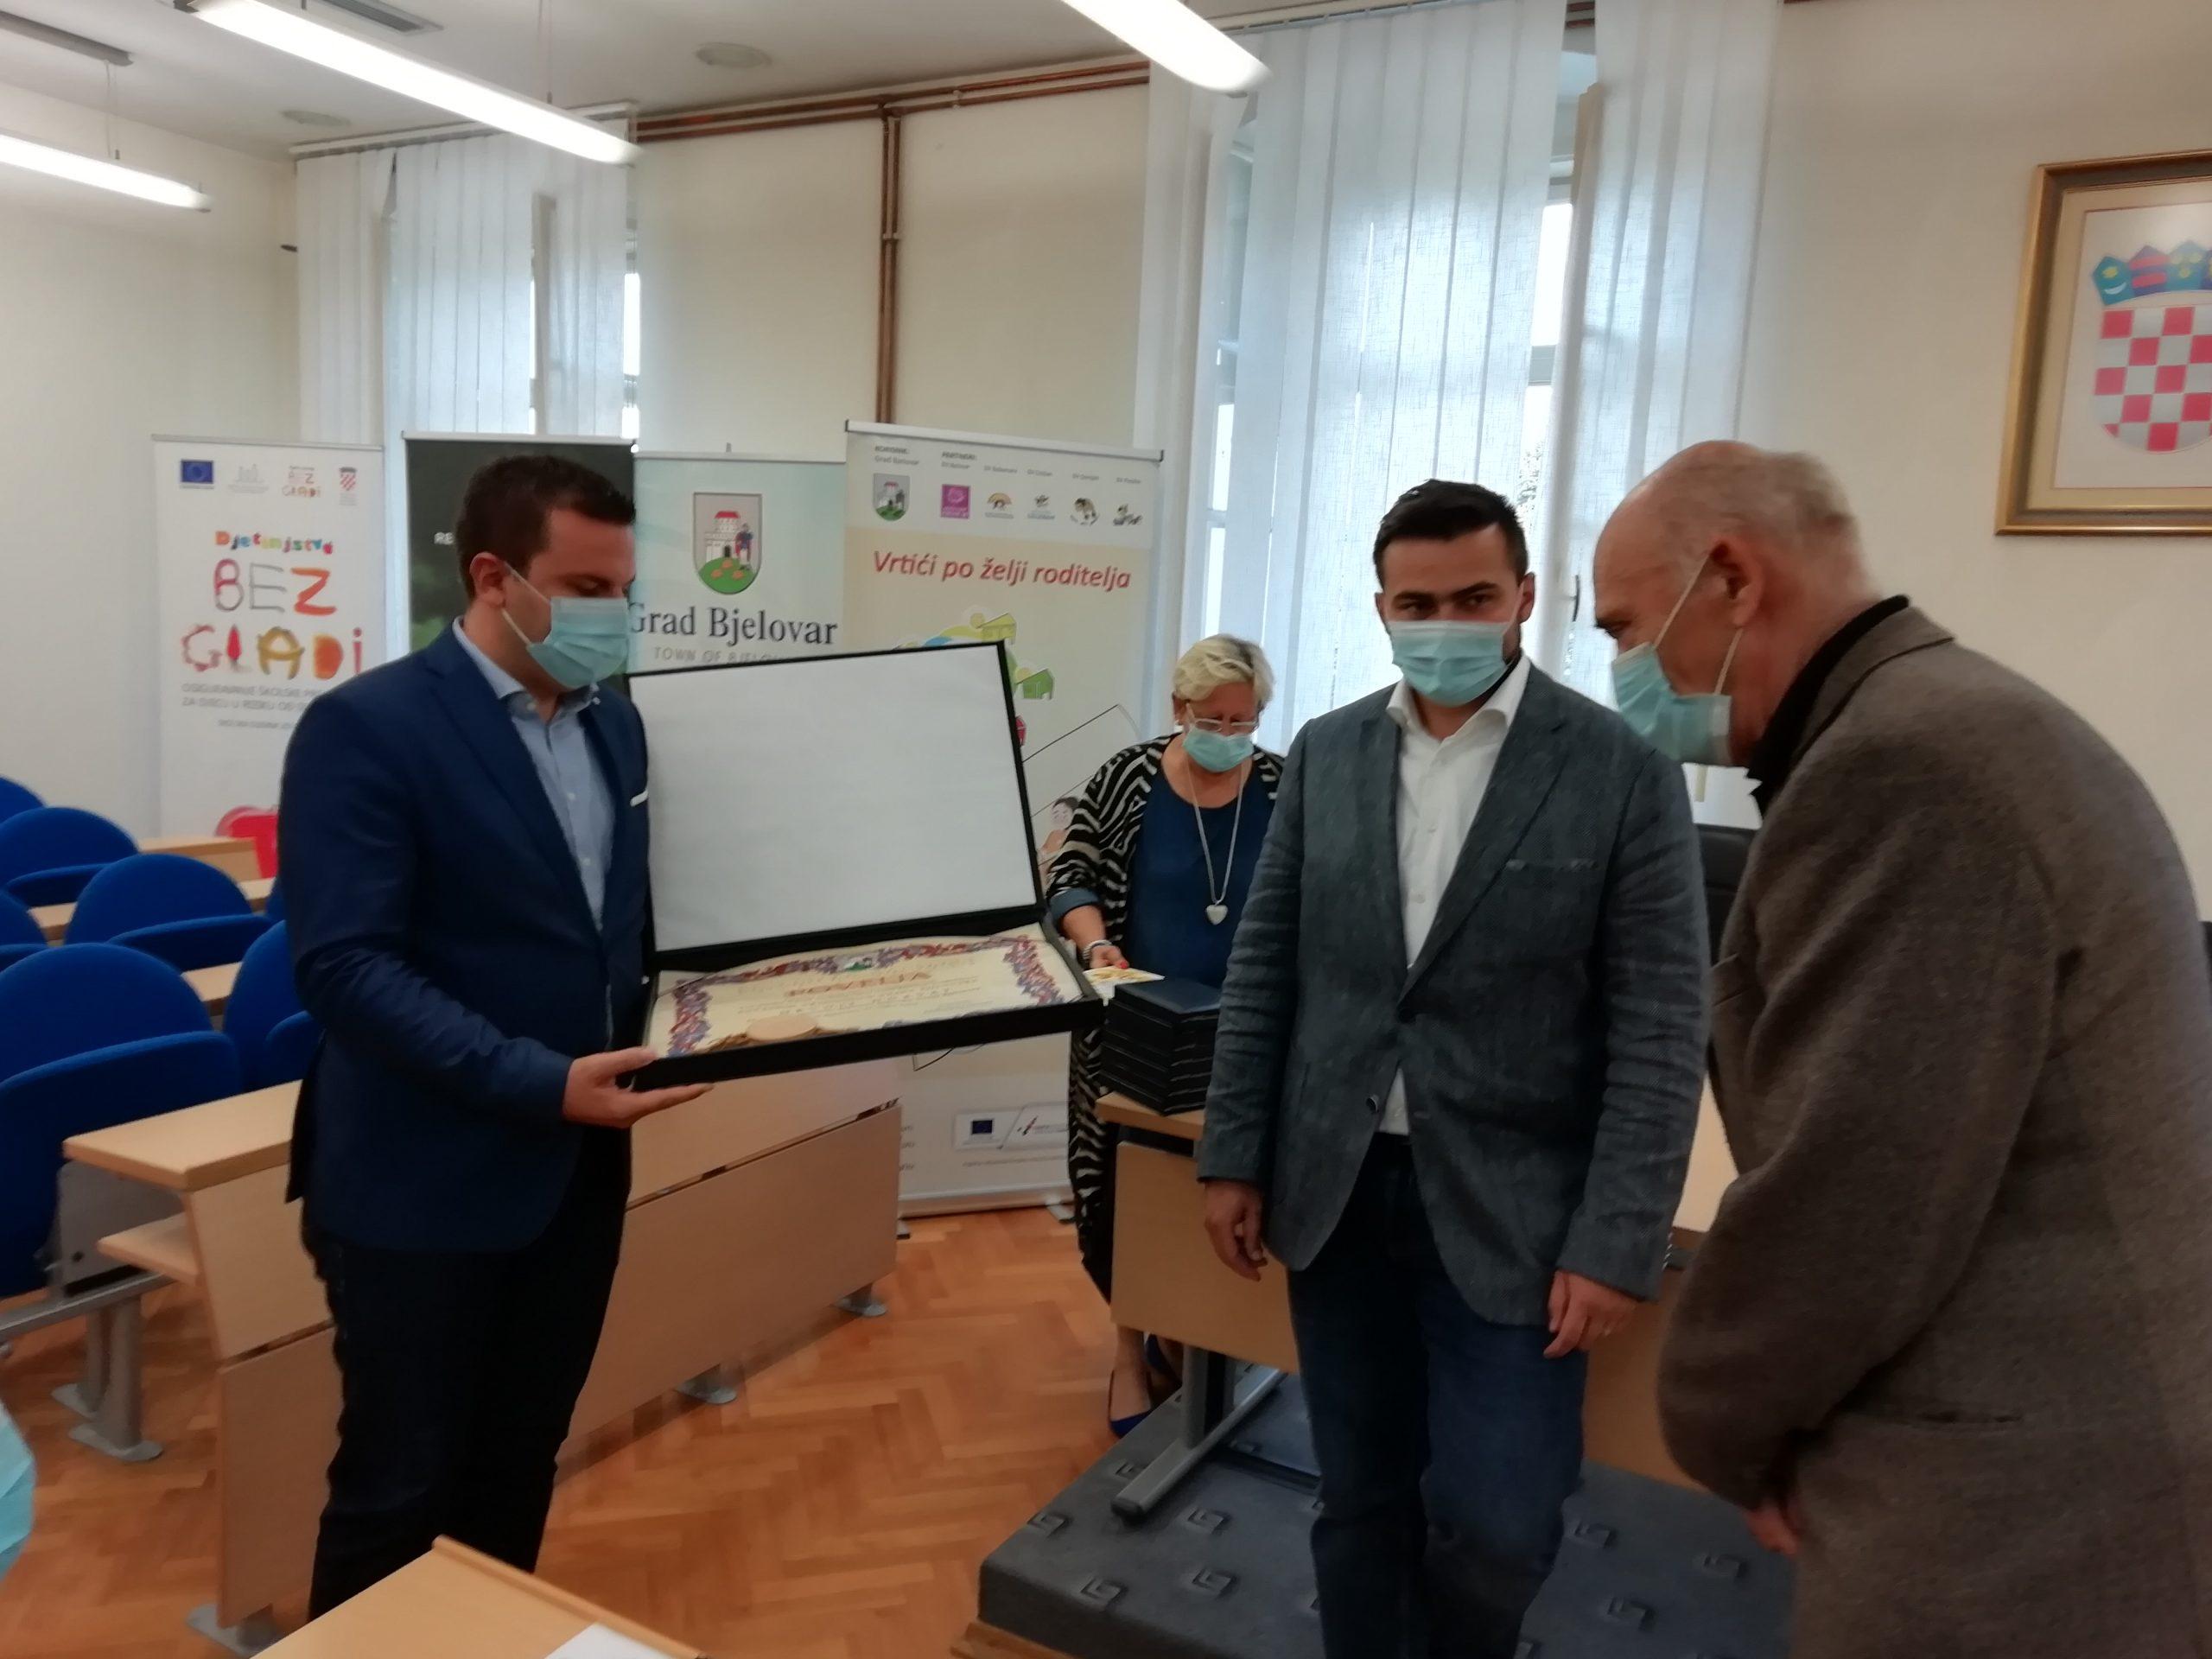 JAVNA PRIZNANJA Legenda rukometa imenovan počasnim građaninom